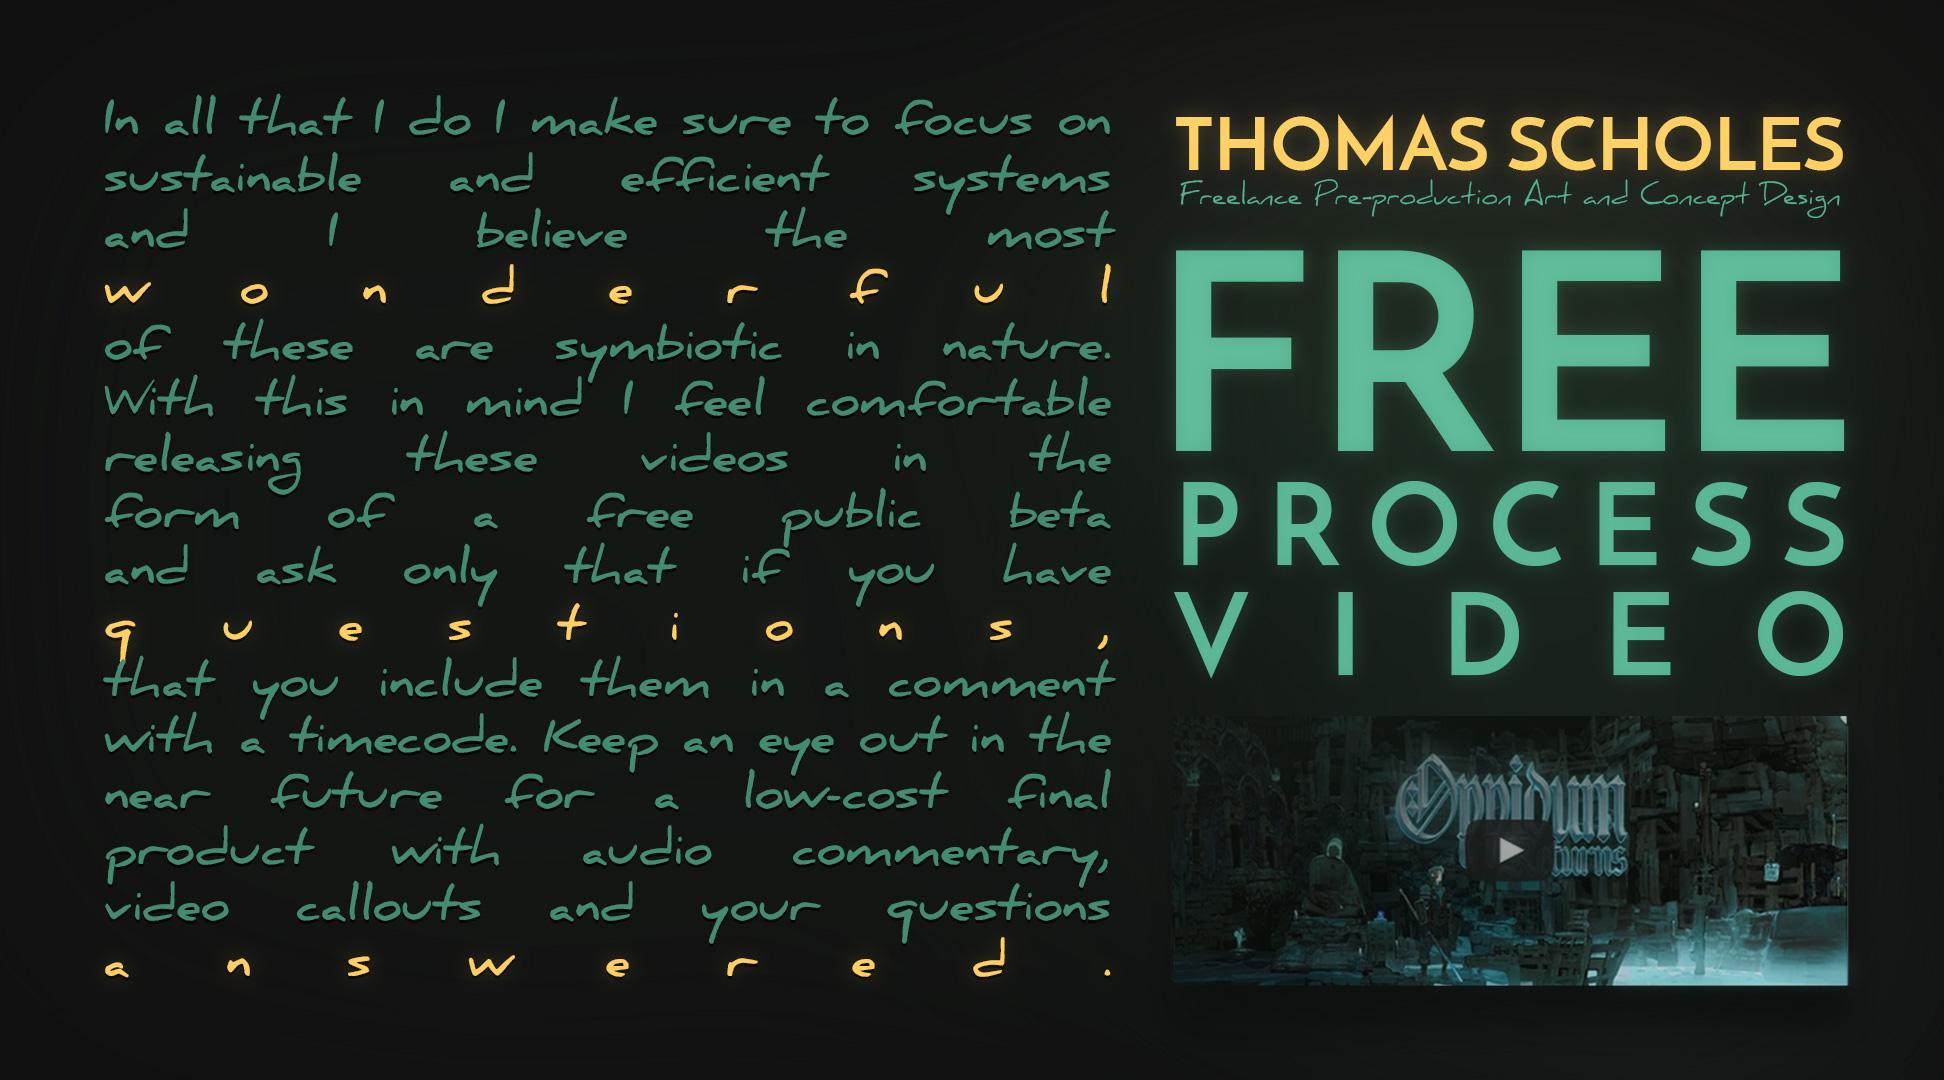 Free Process Video of Oppidum Returns